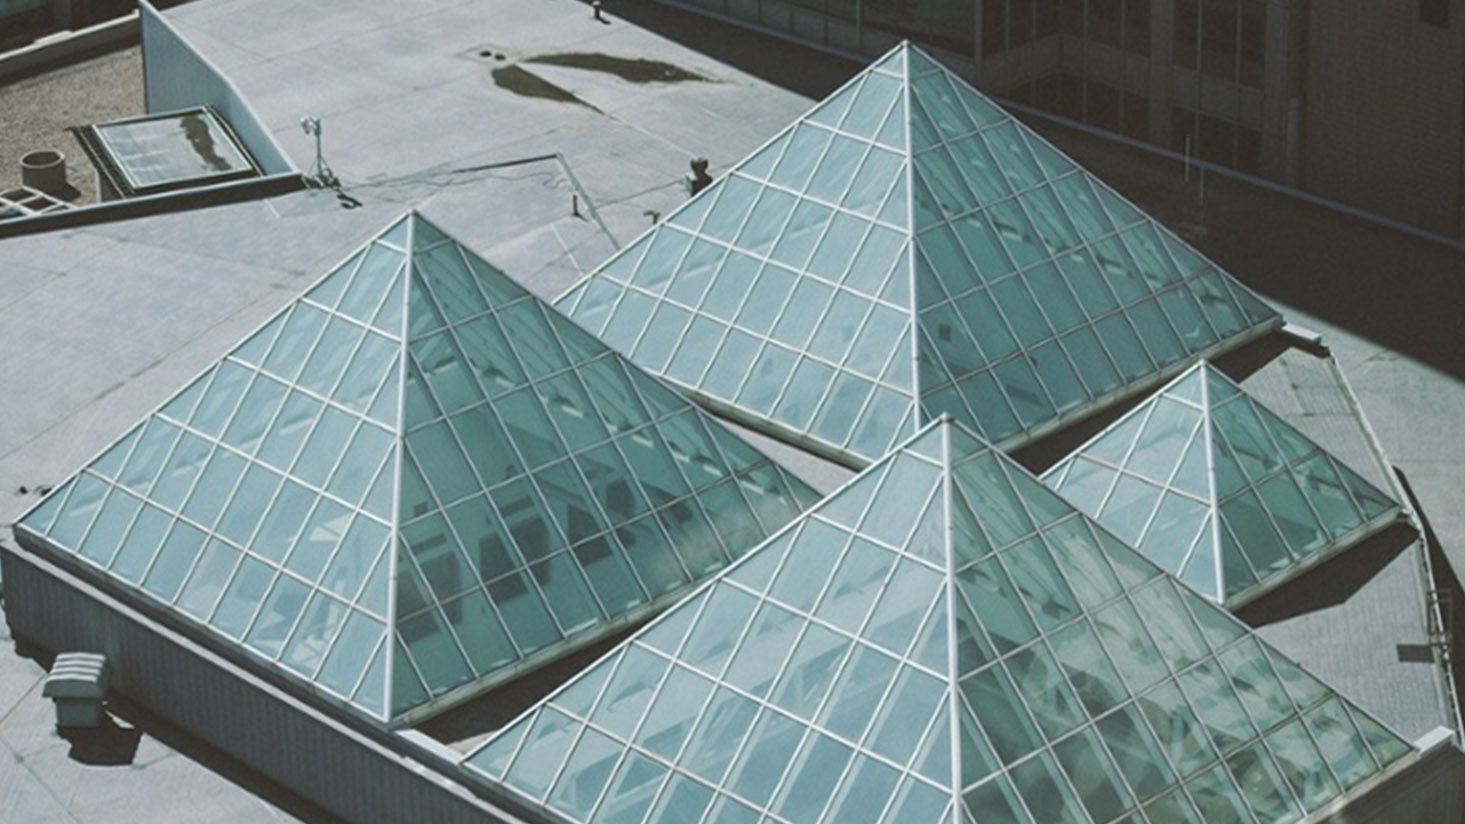 lighting-pyramid-retrofit-projects.jpg